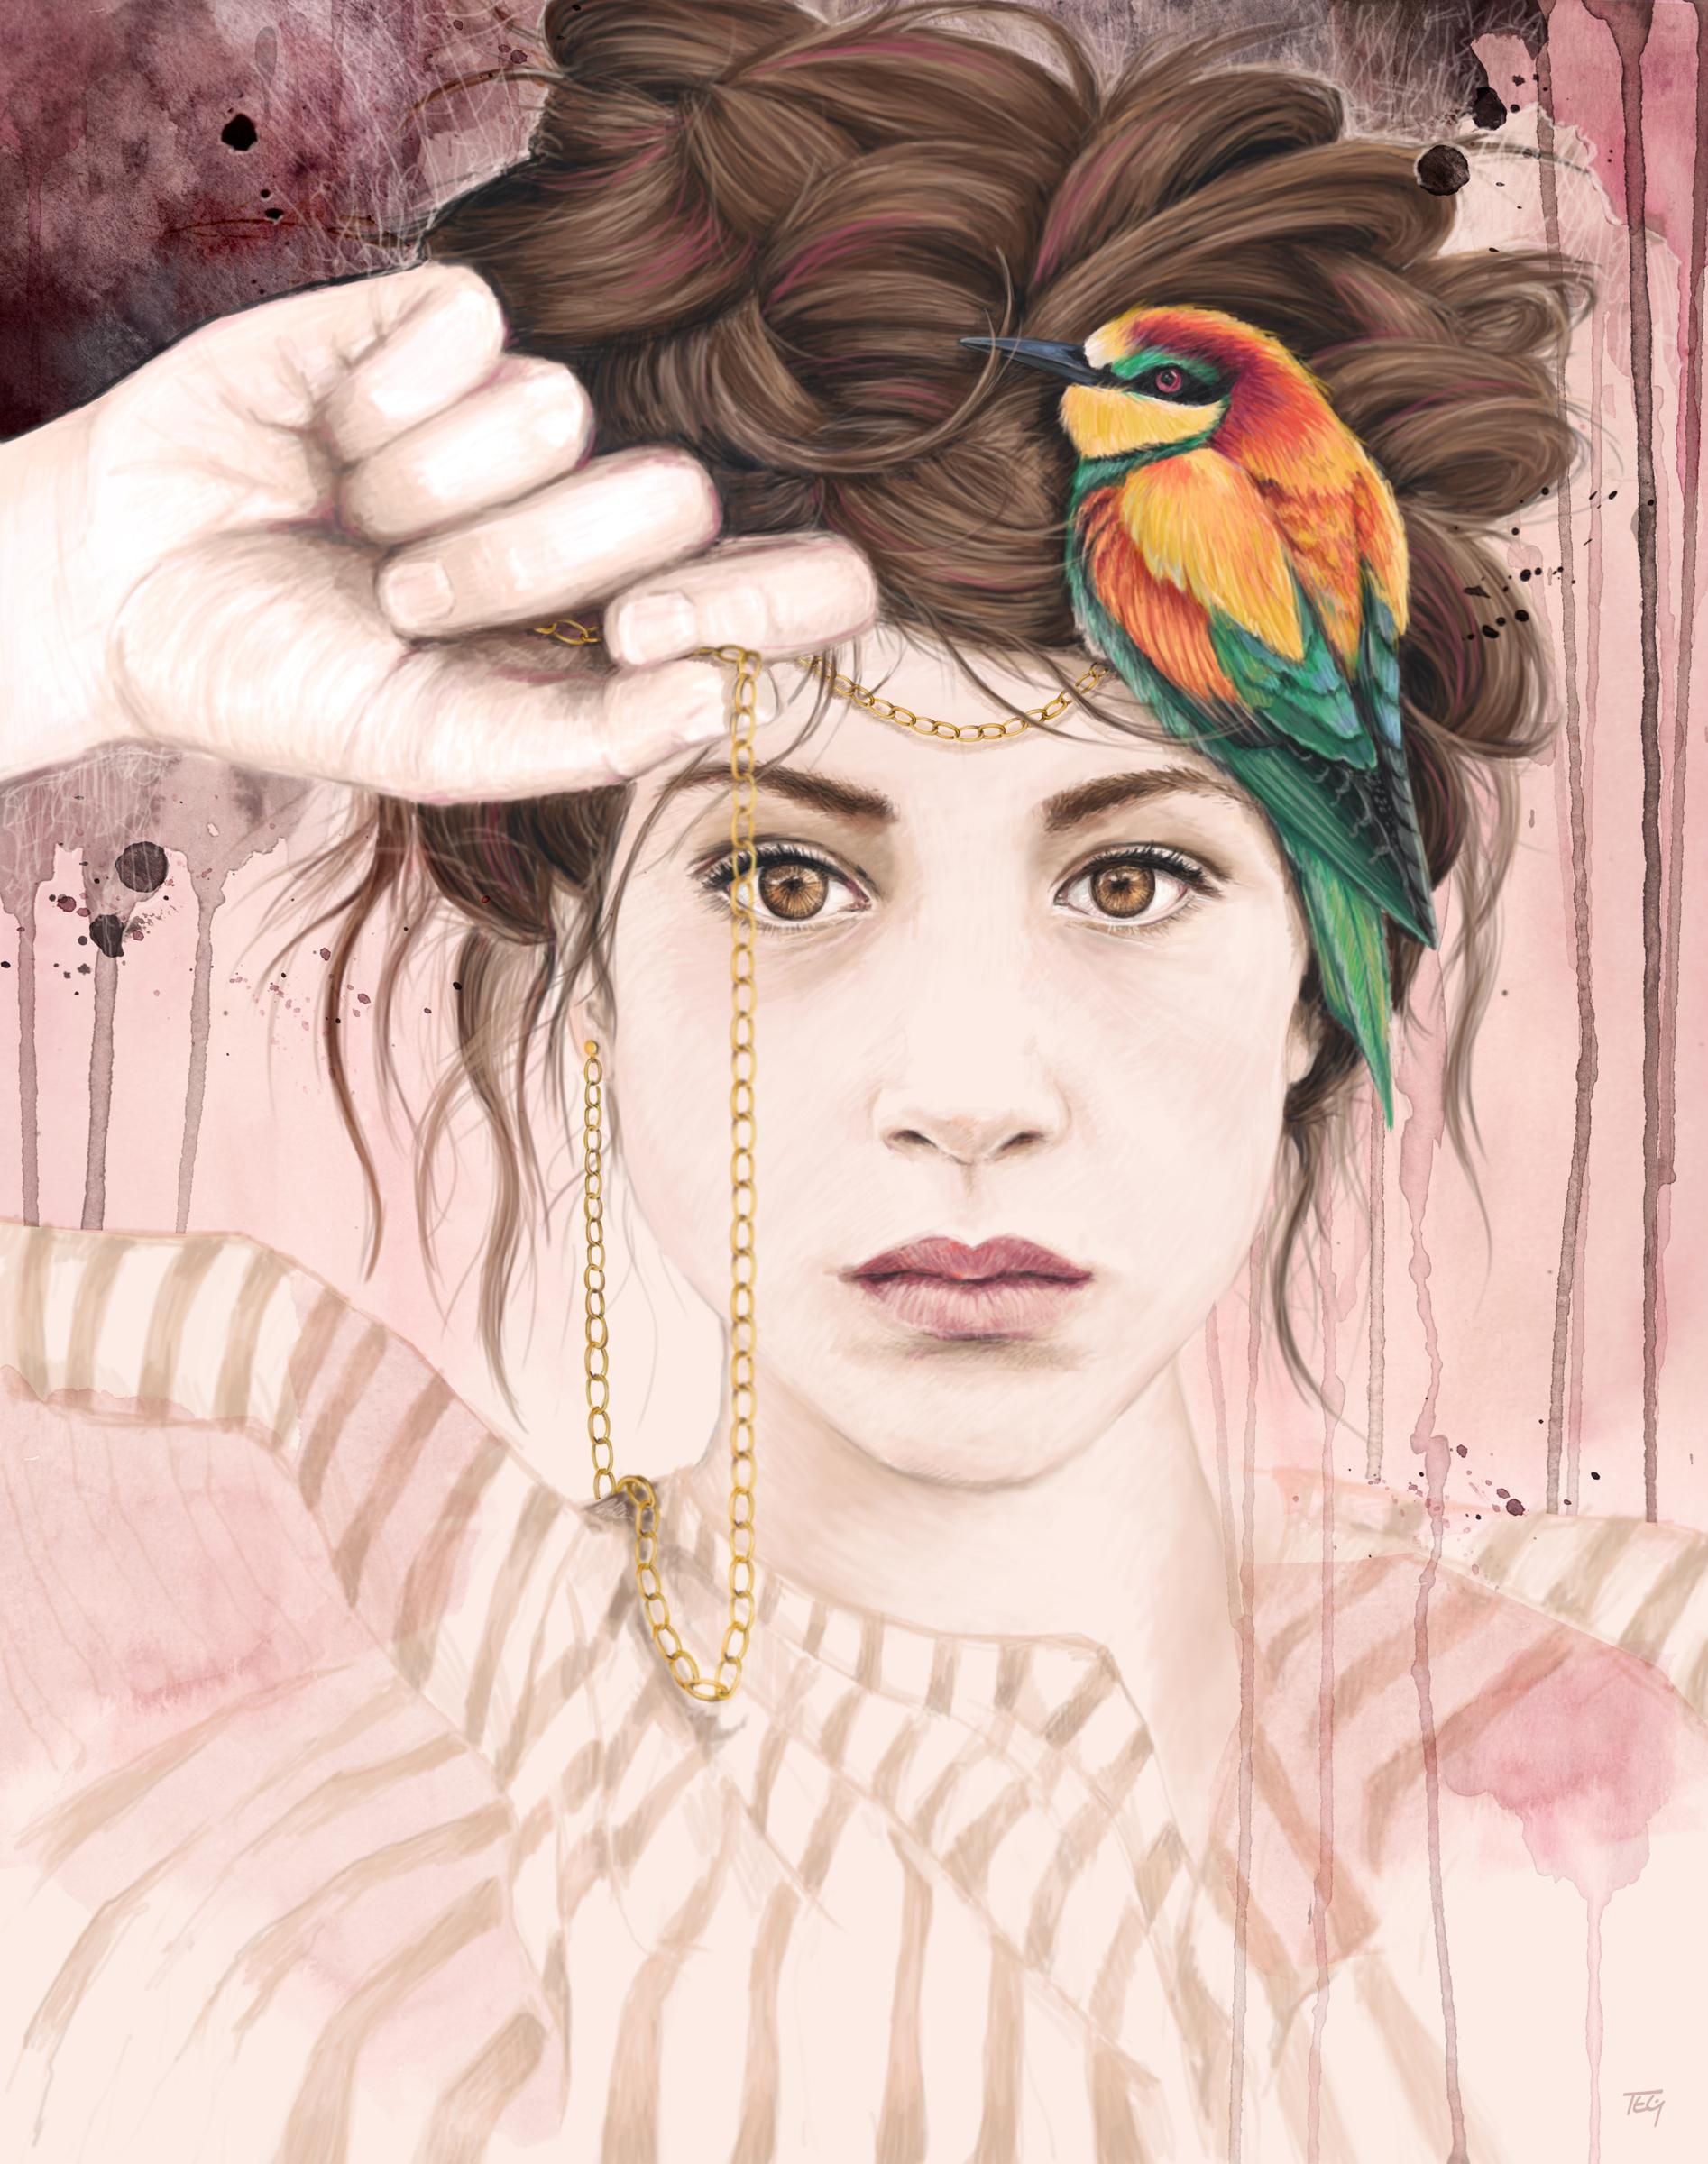 Jailbirds  - watercolor & digital painting, 2015